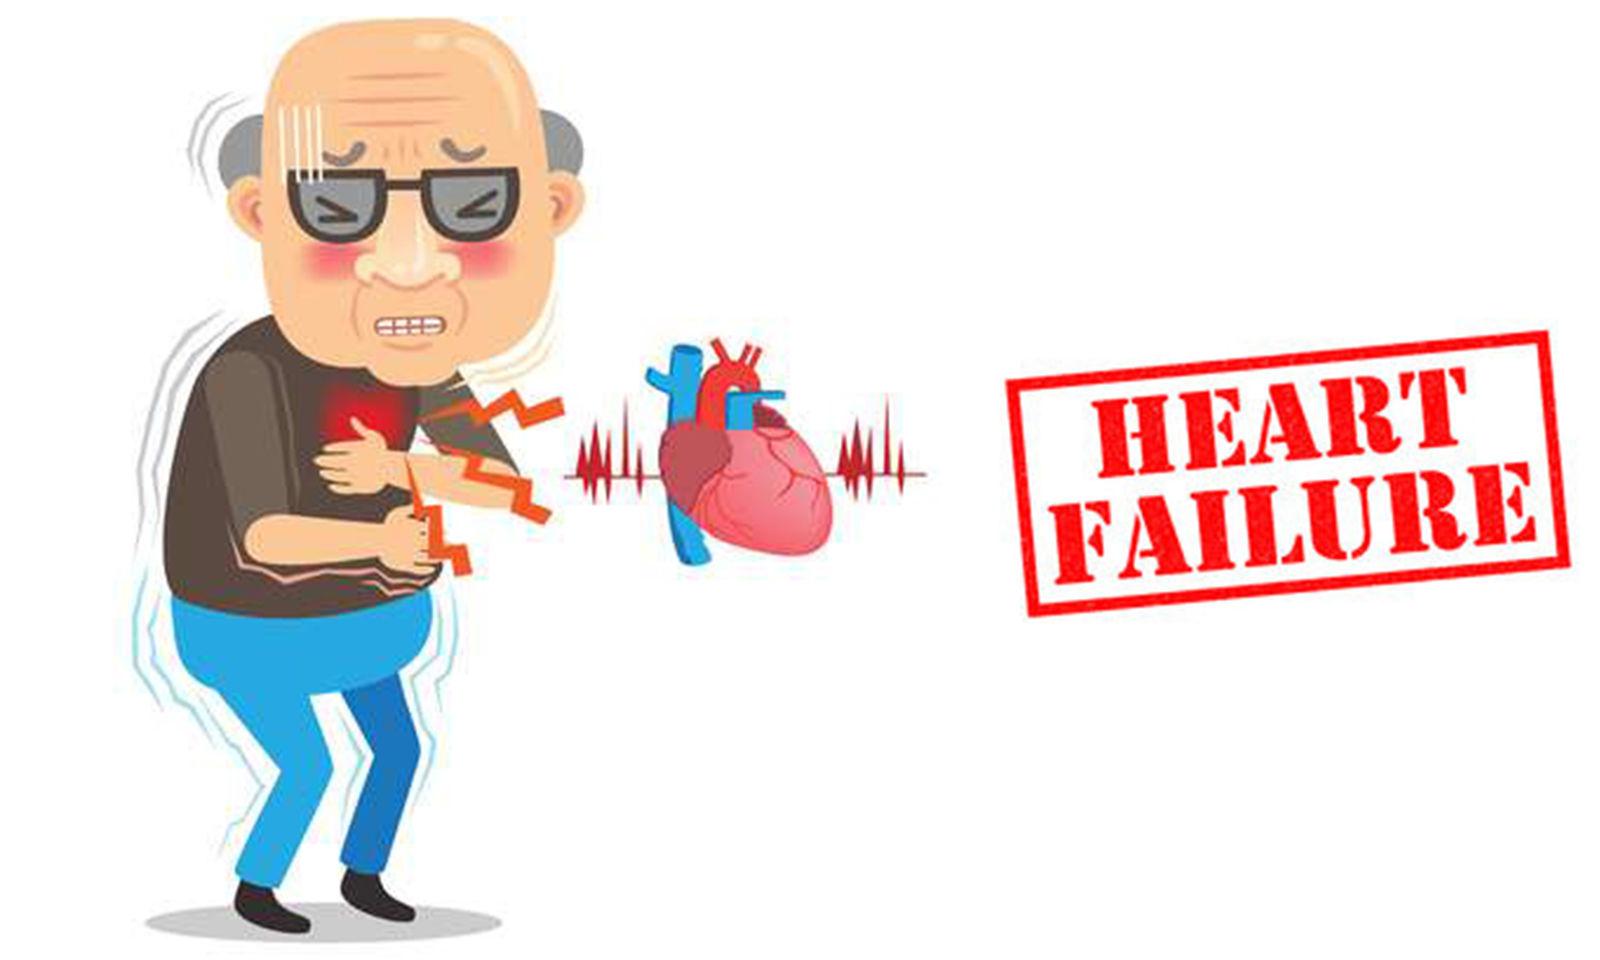 Existing heart failure drug may treat potential COVID-19 long-hauler symptom - Medical Dialogues